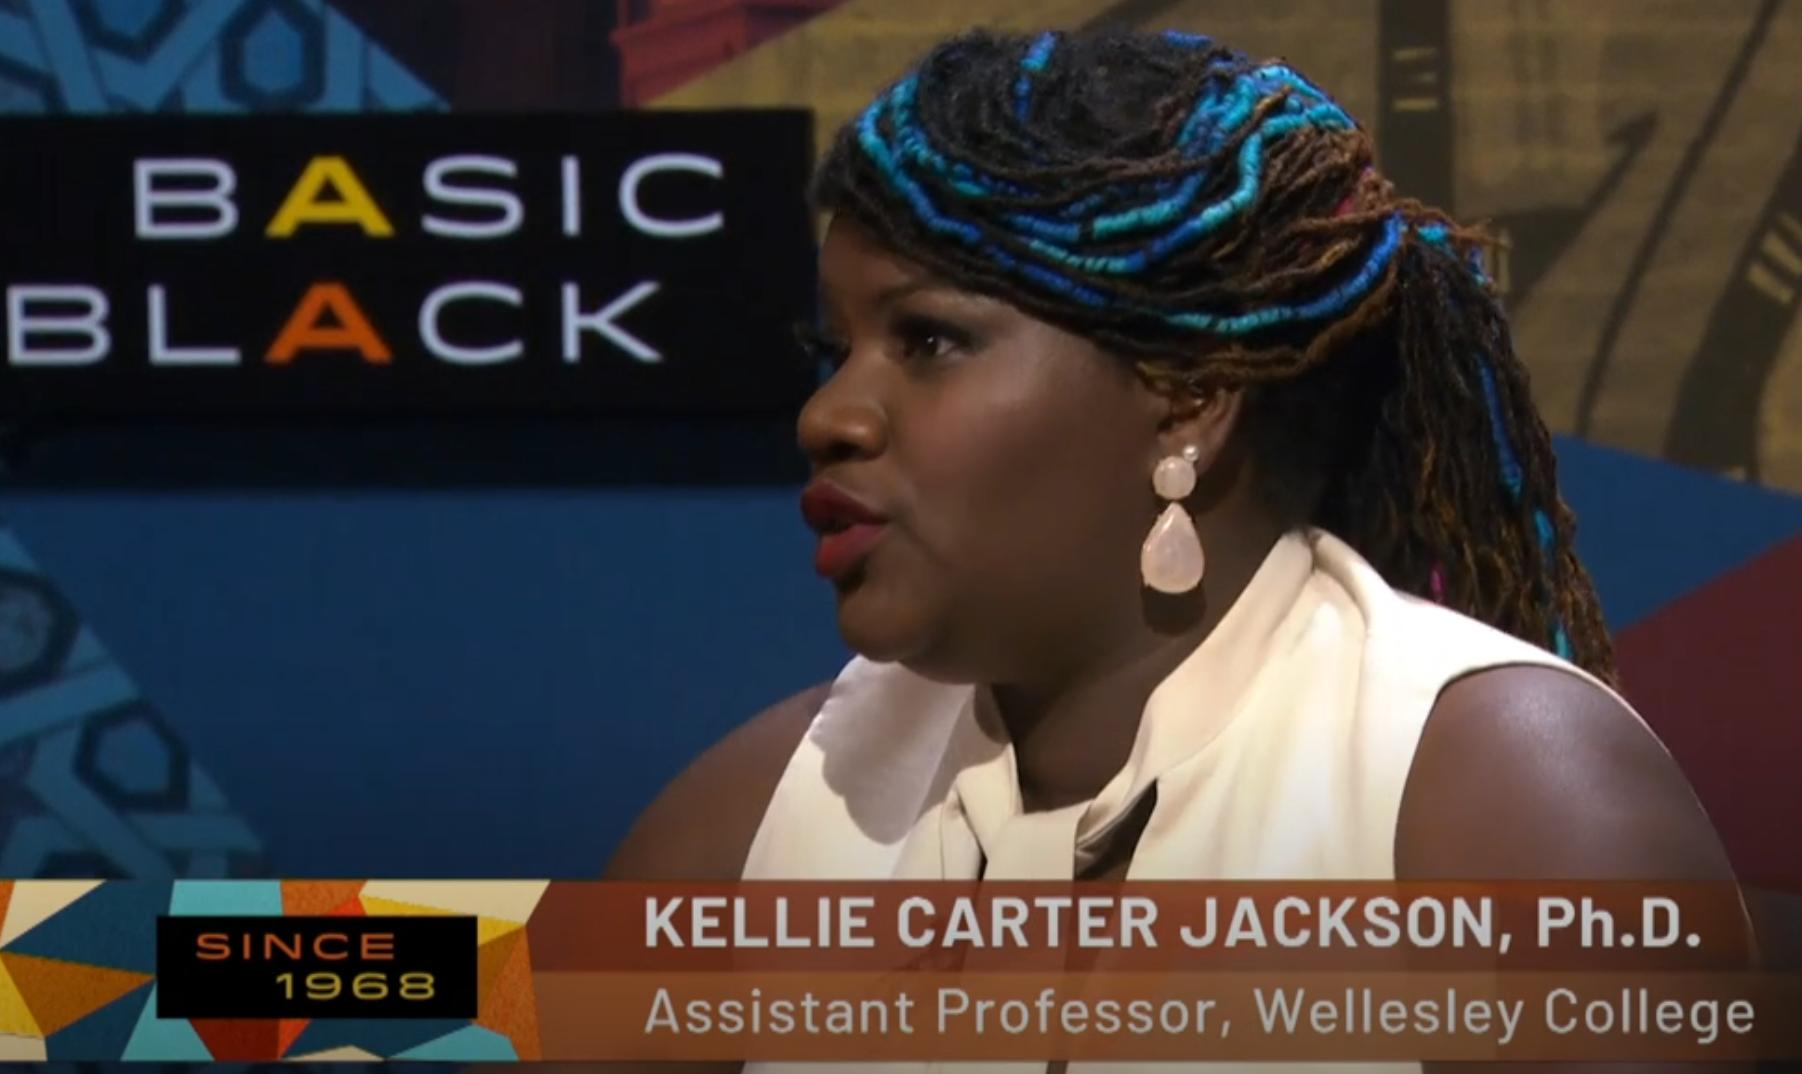 Basic Black's Conversation on Cultural Identity -